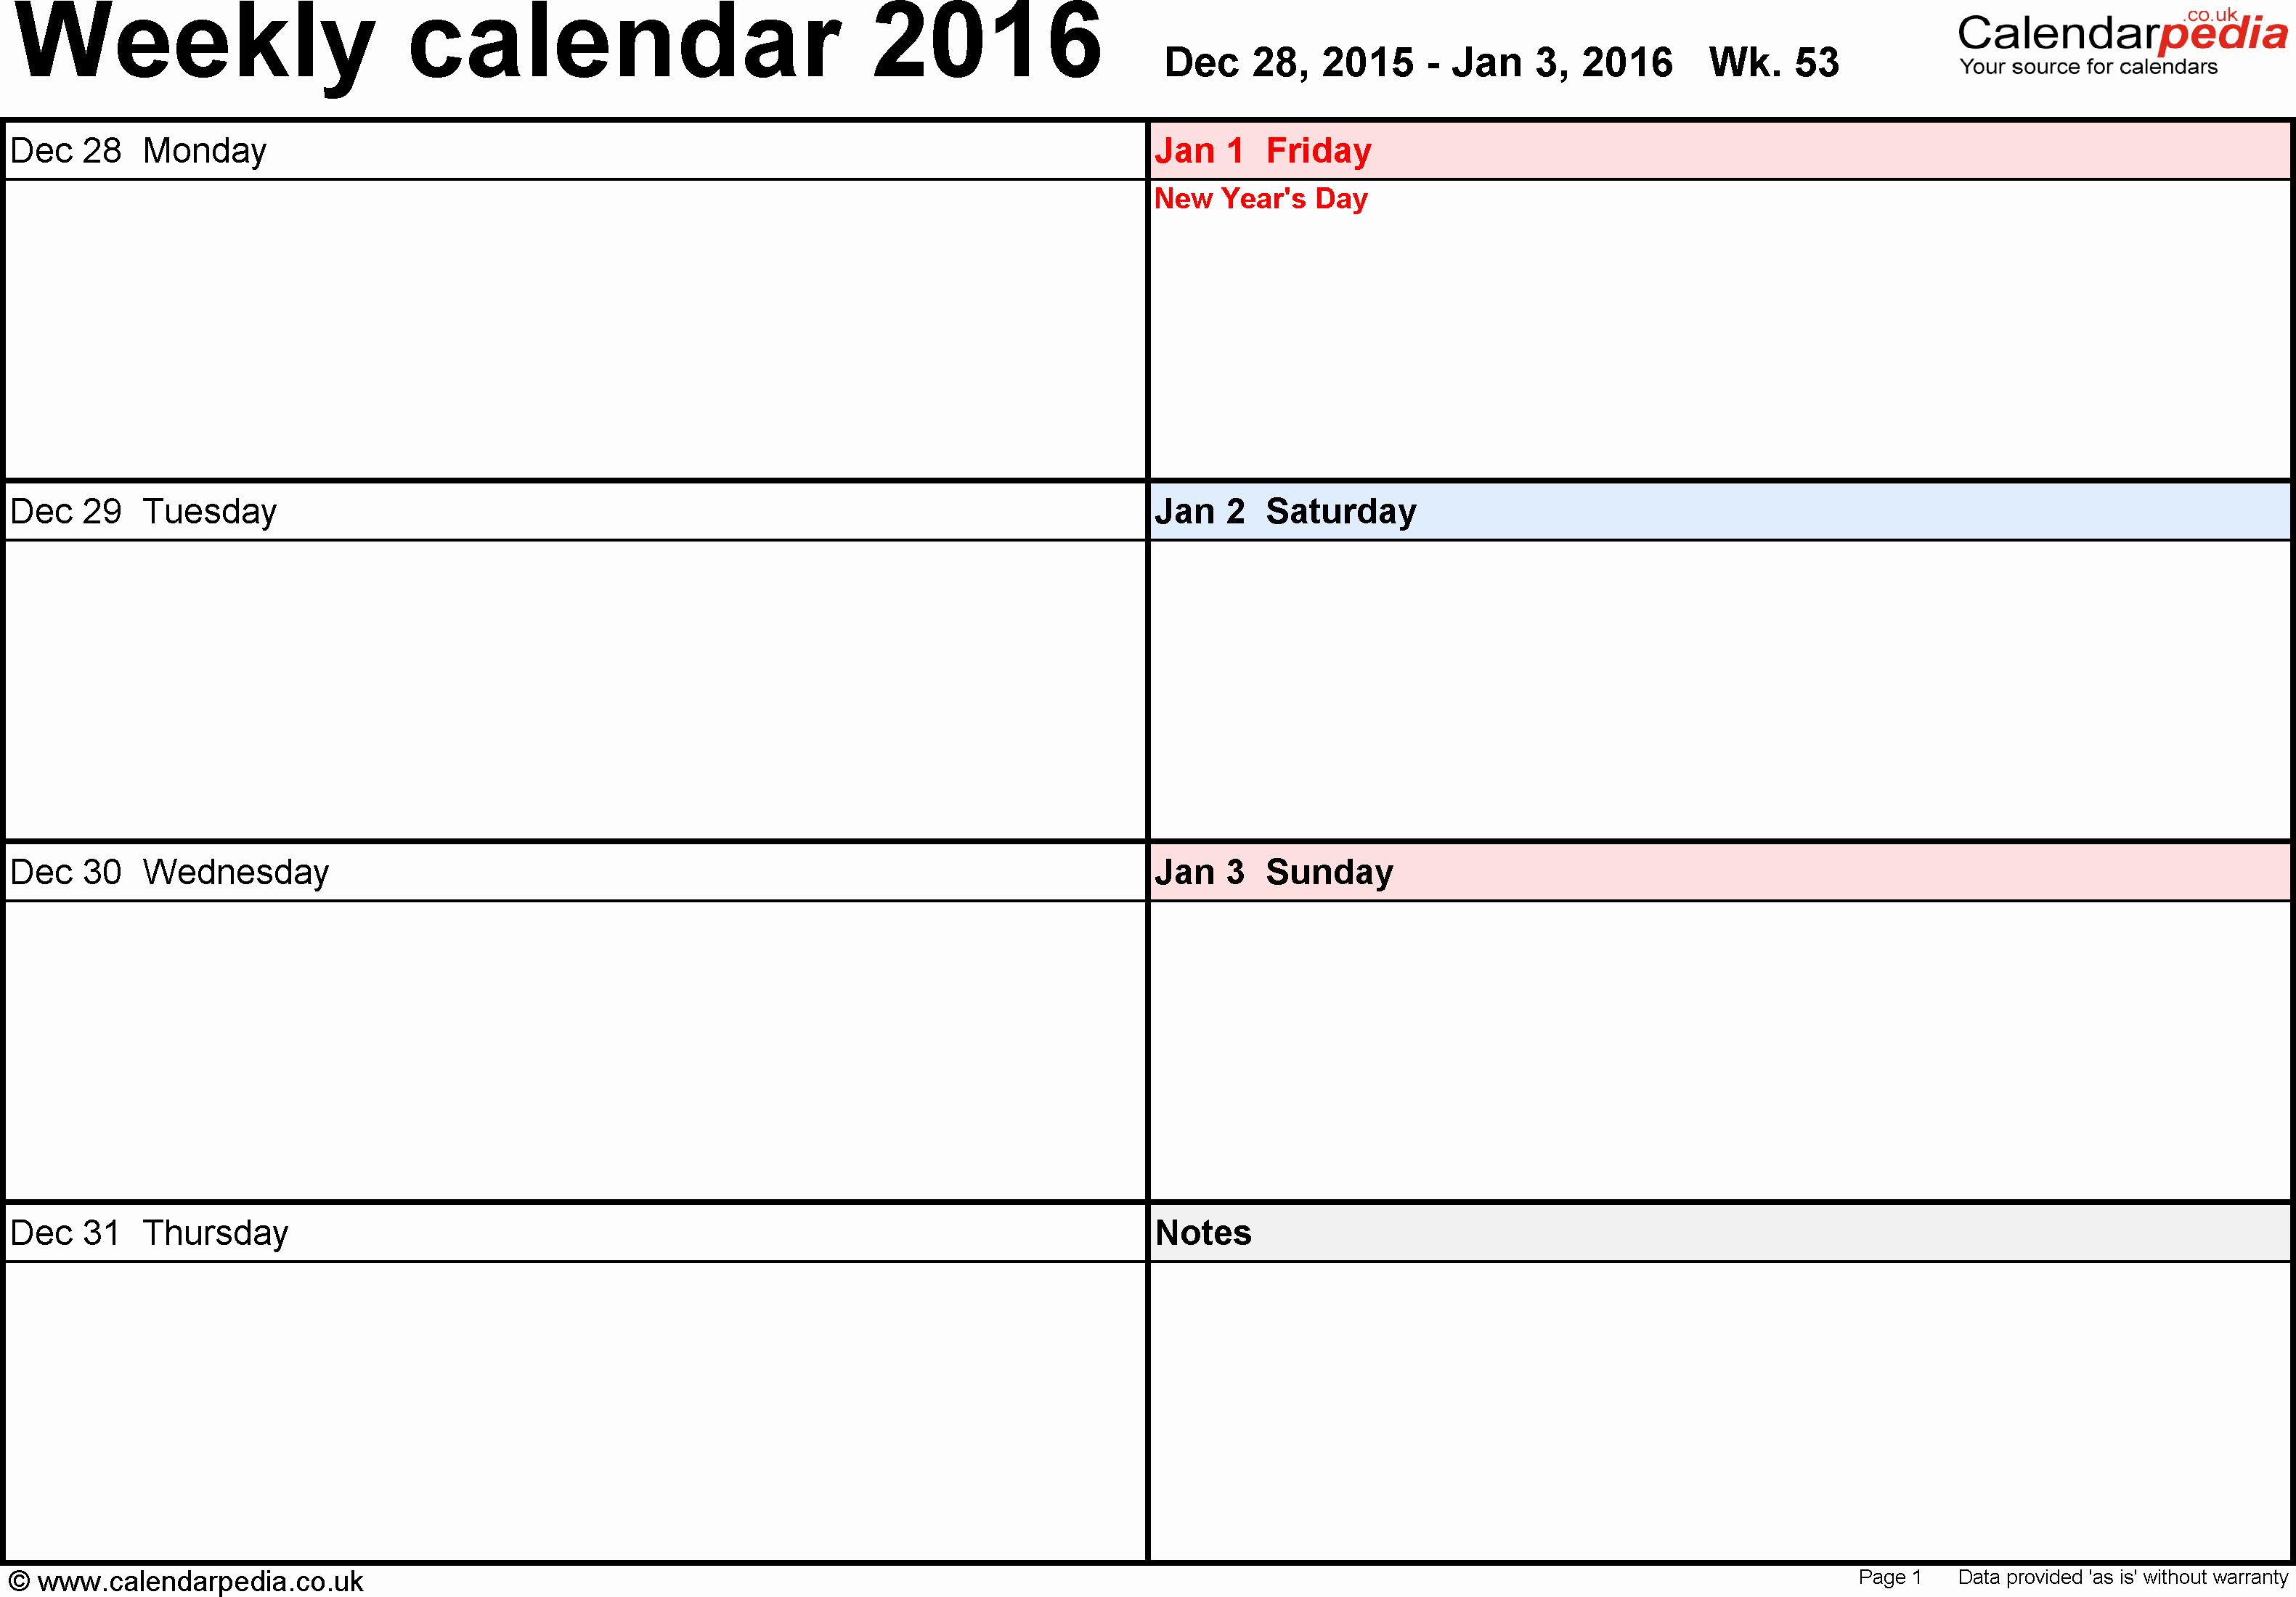 One Week Schedule Template Fresh Weekly Calendar 2016 Uk Free Printable Templates for Word